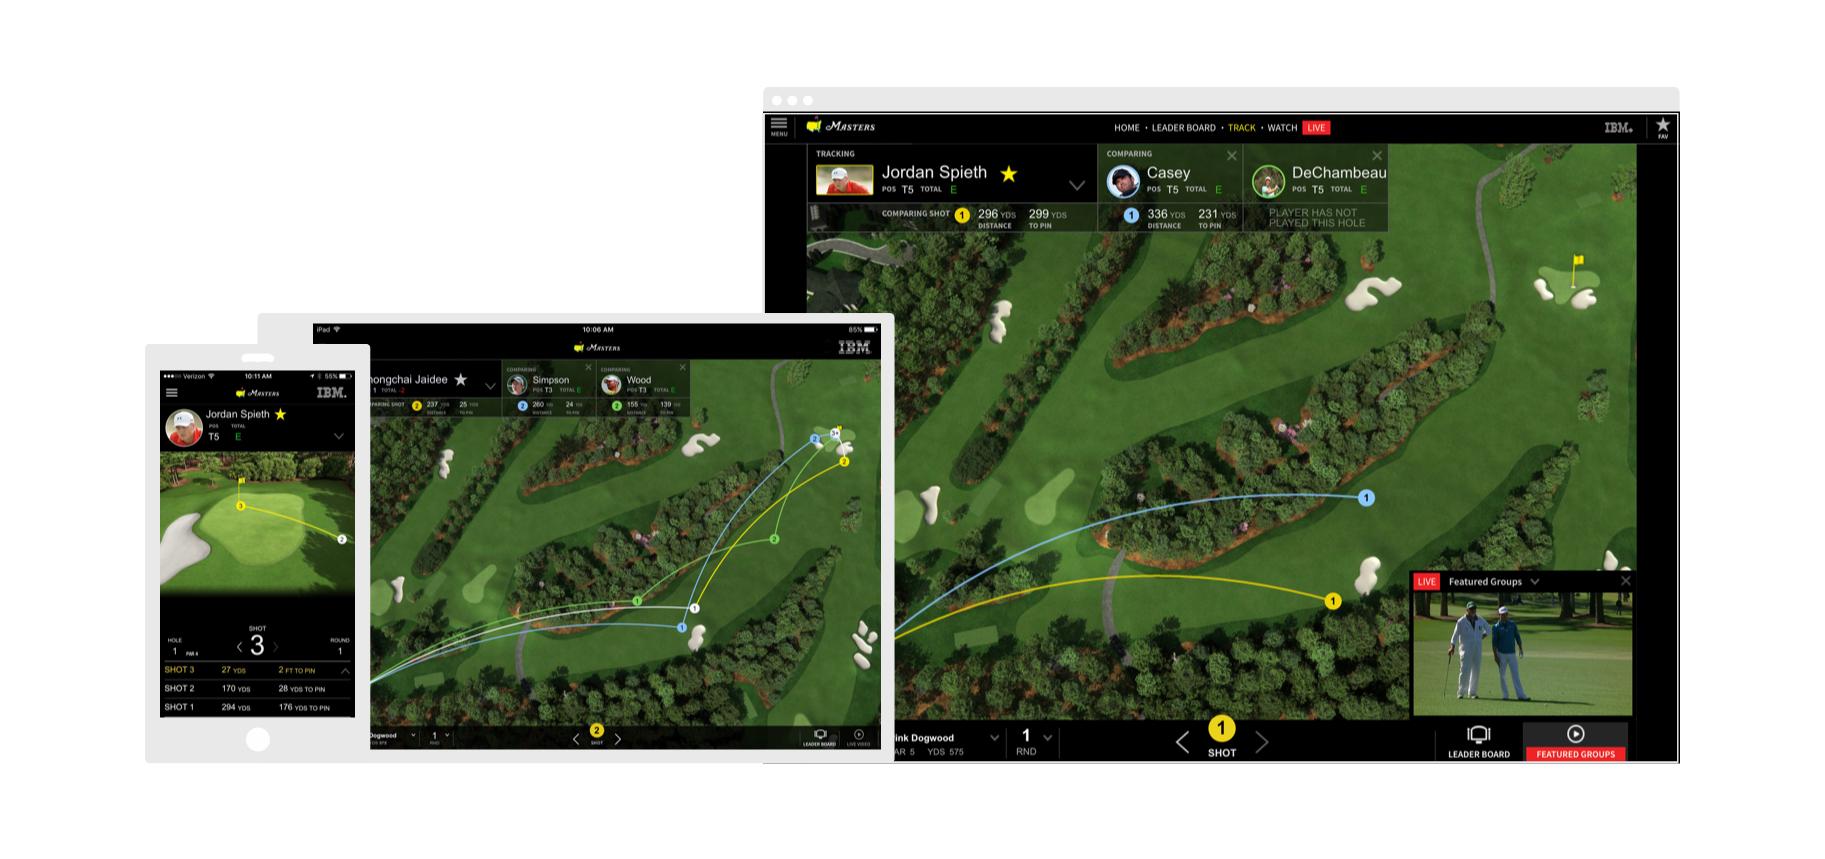 Mobile app, iPad app, and desktop version